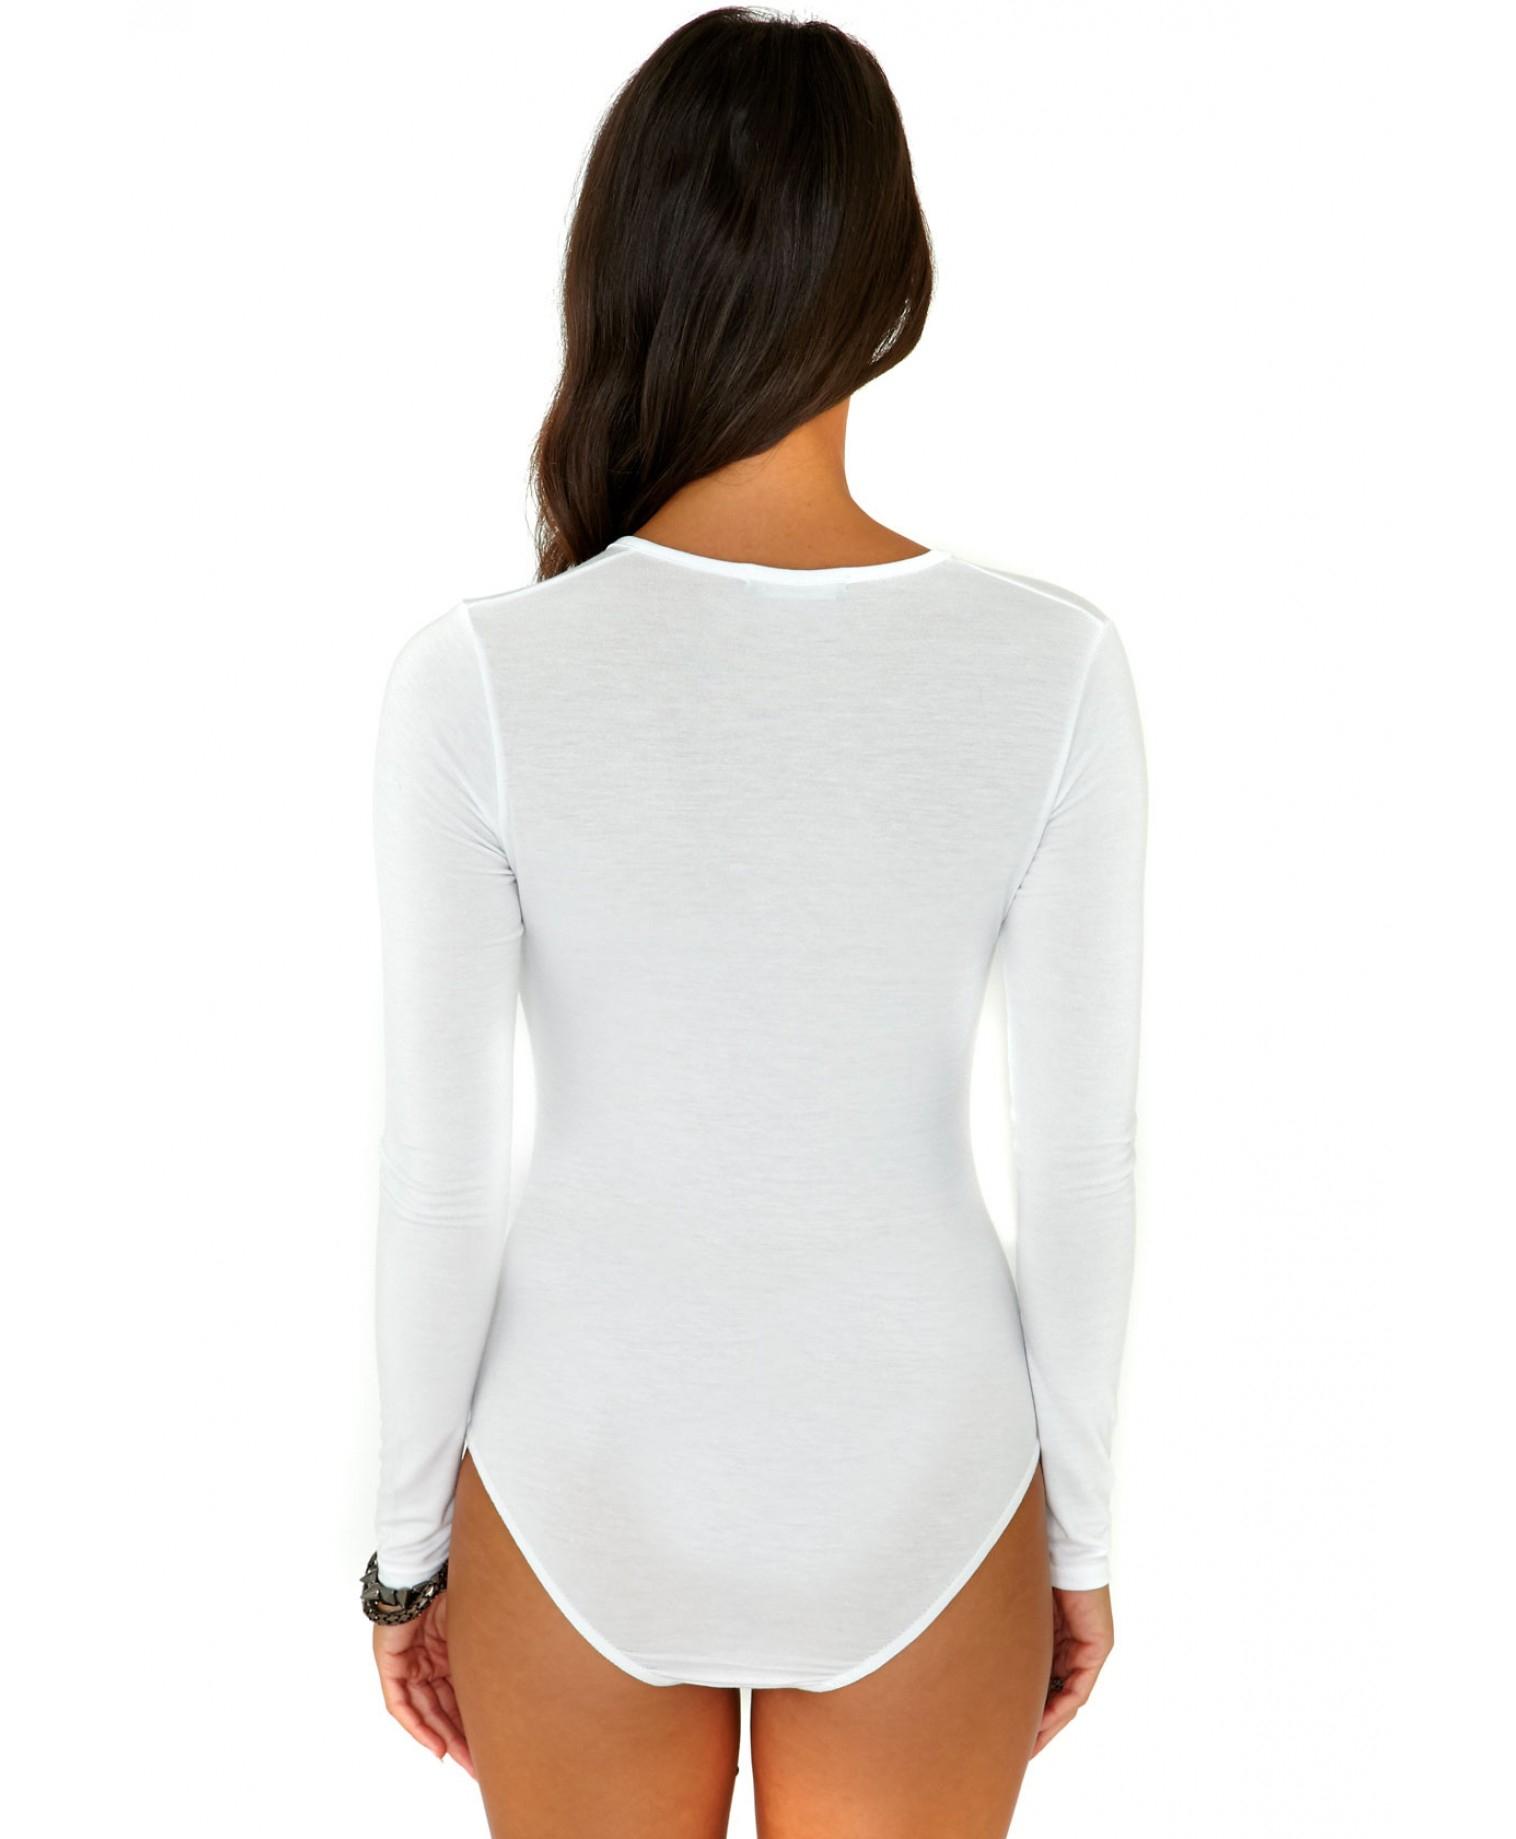 2170c0746f Missguided Guanita Long Sleeve V-Neck Bodysuit In White in White - Lyst